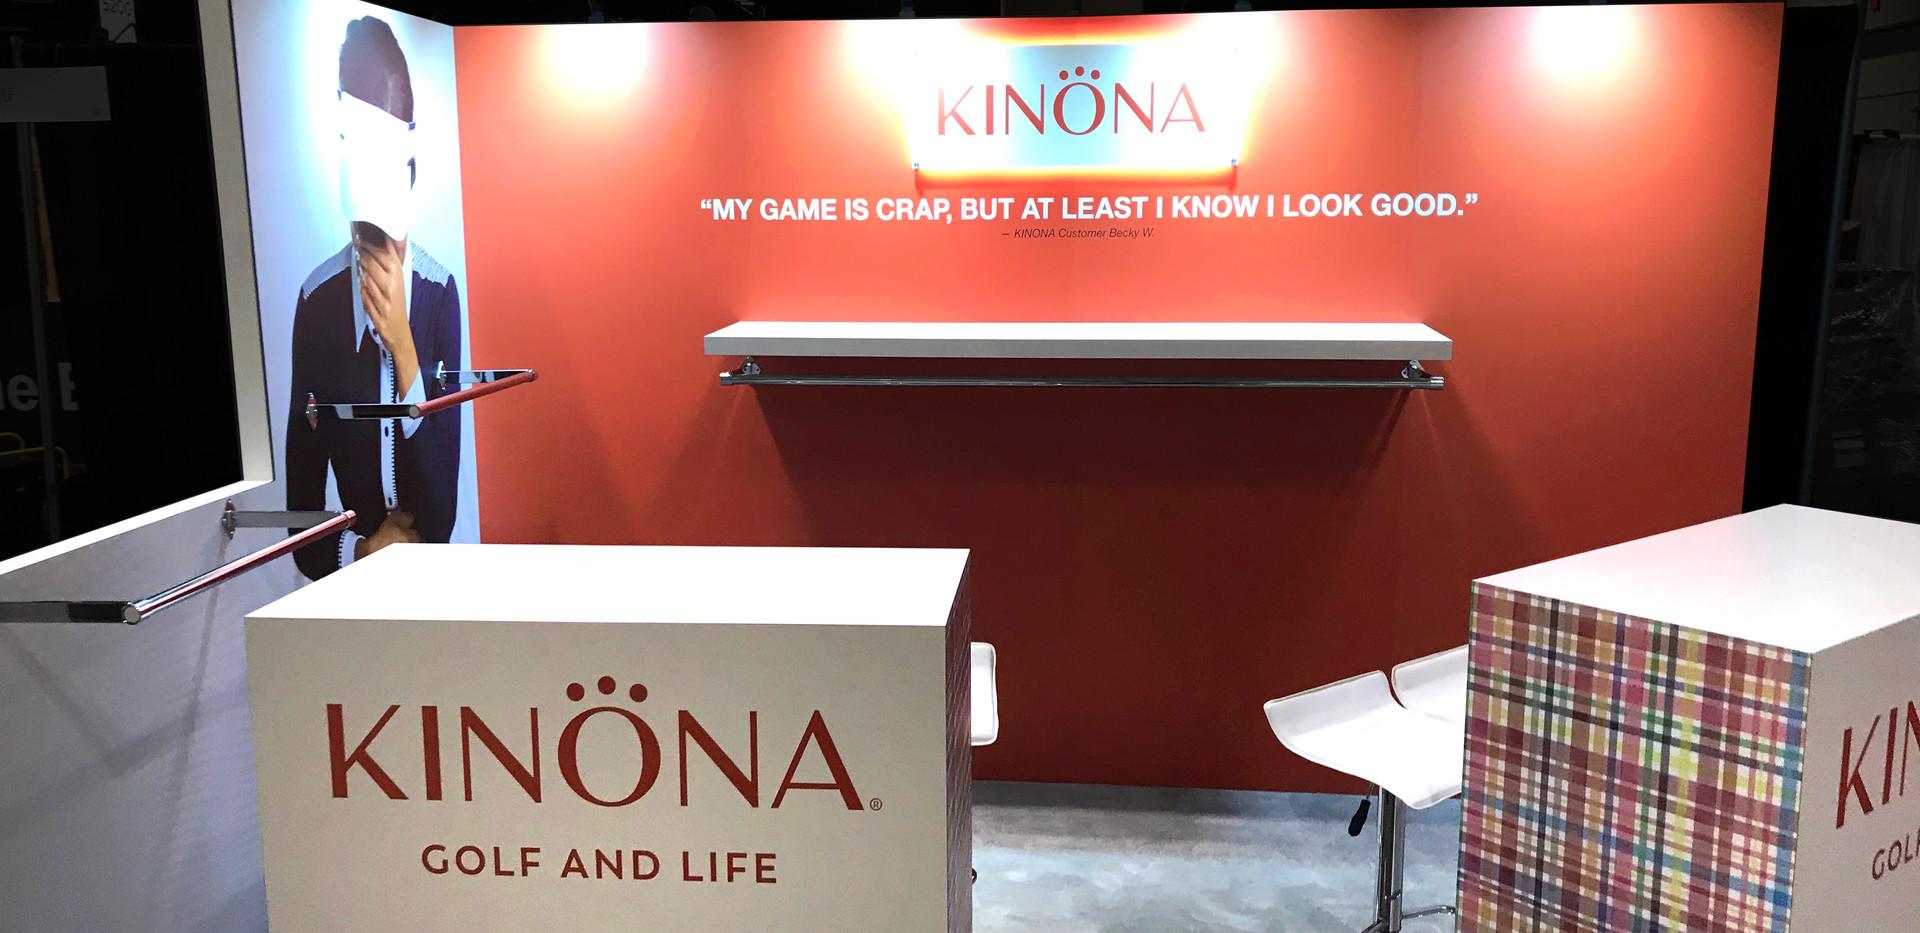 Kinona Booth Photo (1).jpg